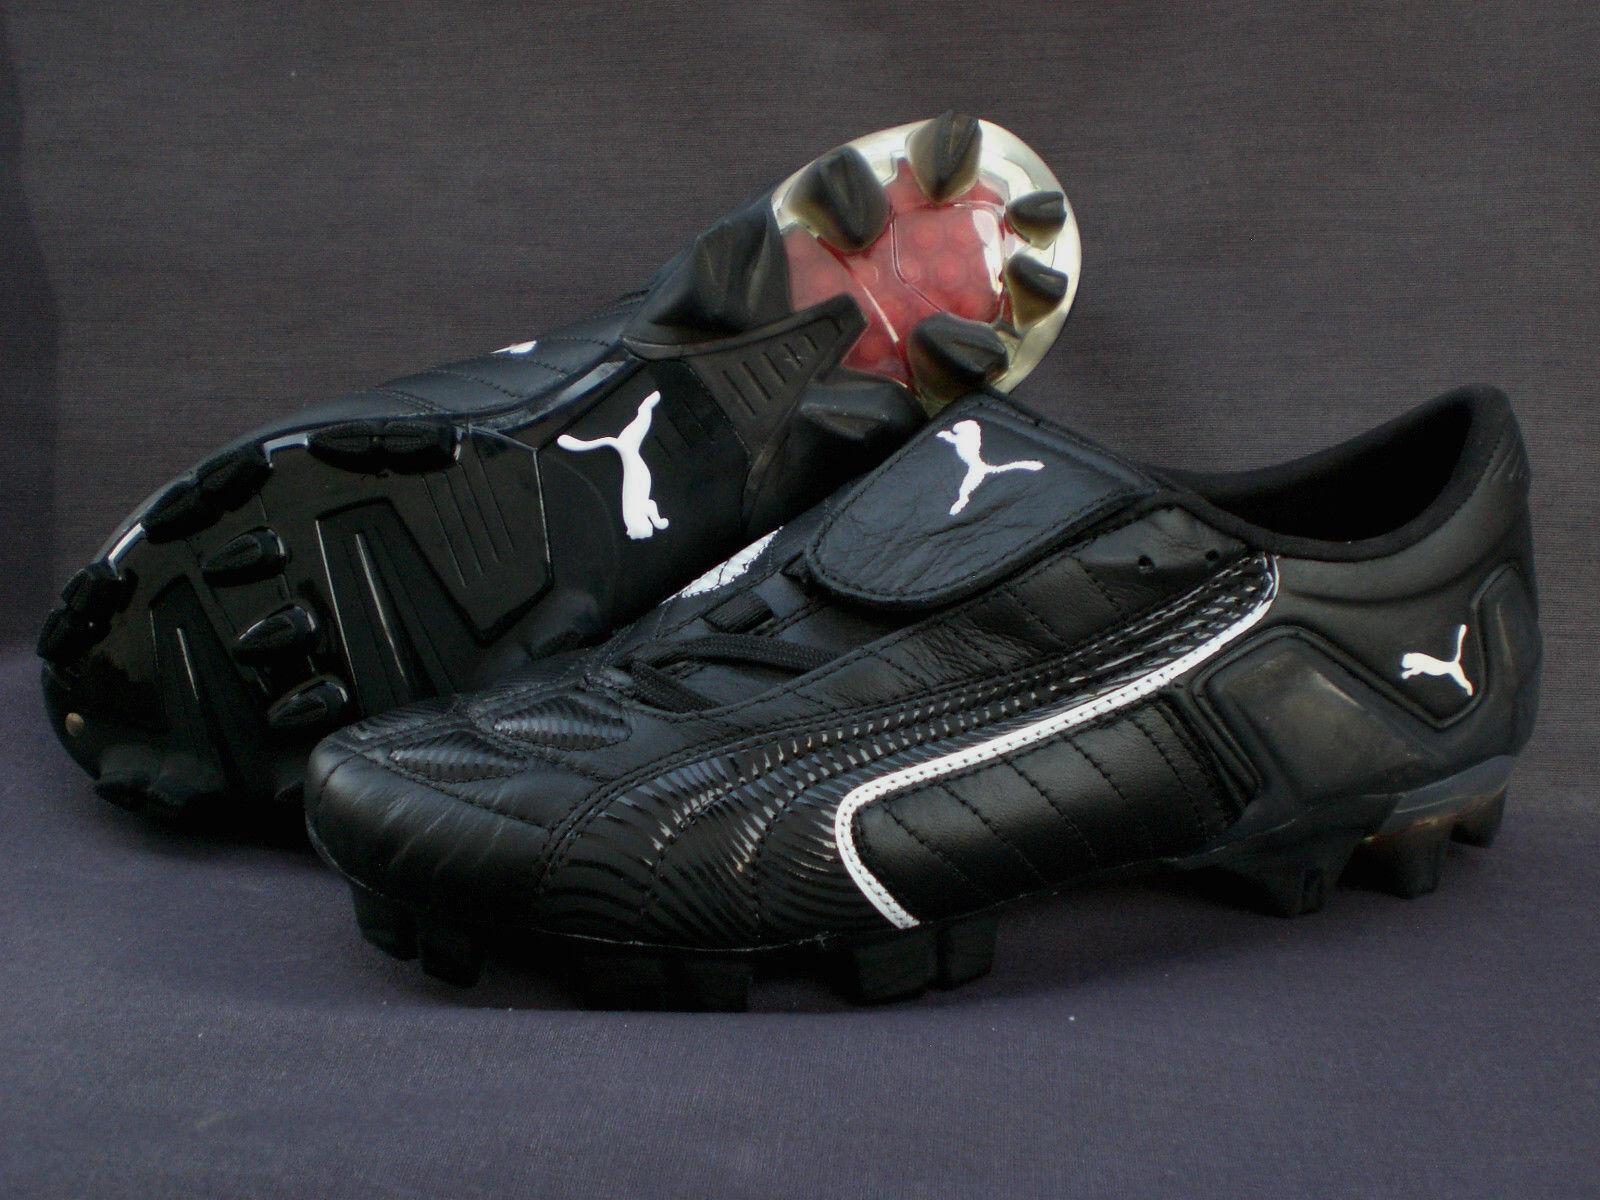 Fussballschuhe Stolen Puma V-Konstrukt 08 GC FG Schwarz Leder Größe  41-46 5 Neu